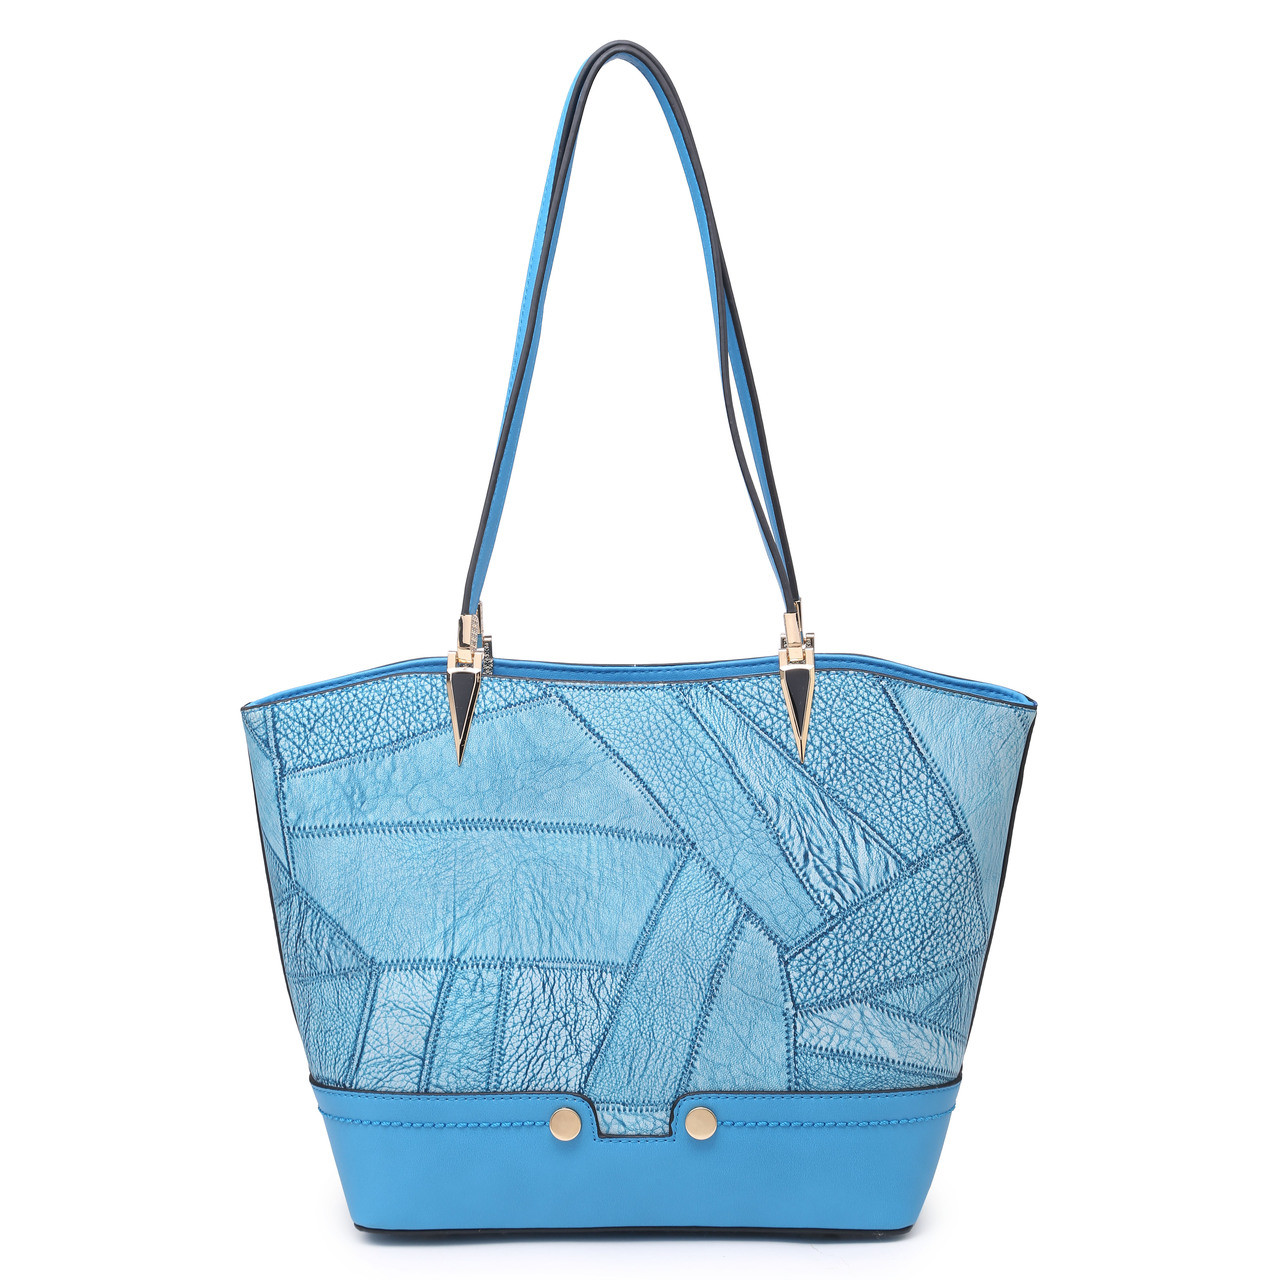 dec400557e1 Kangaroo Women's Fashion Puzzle Handbag Leather Shoulder Tote Bags and  Purses